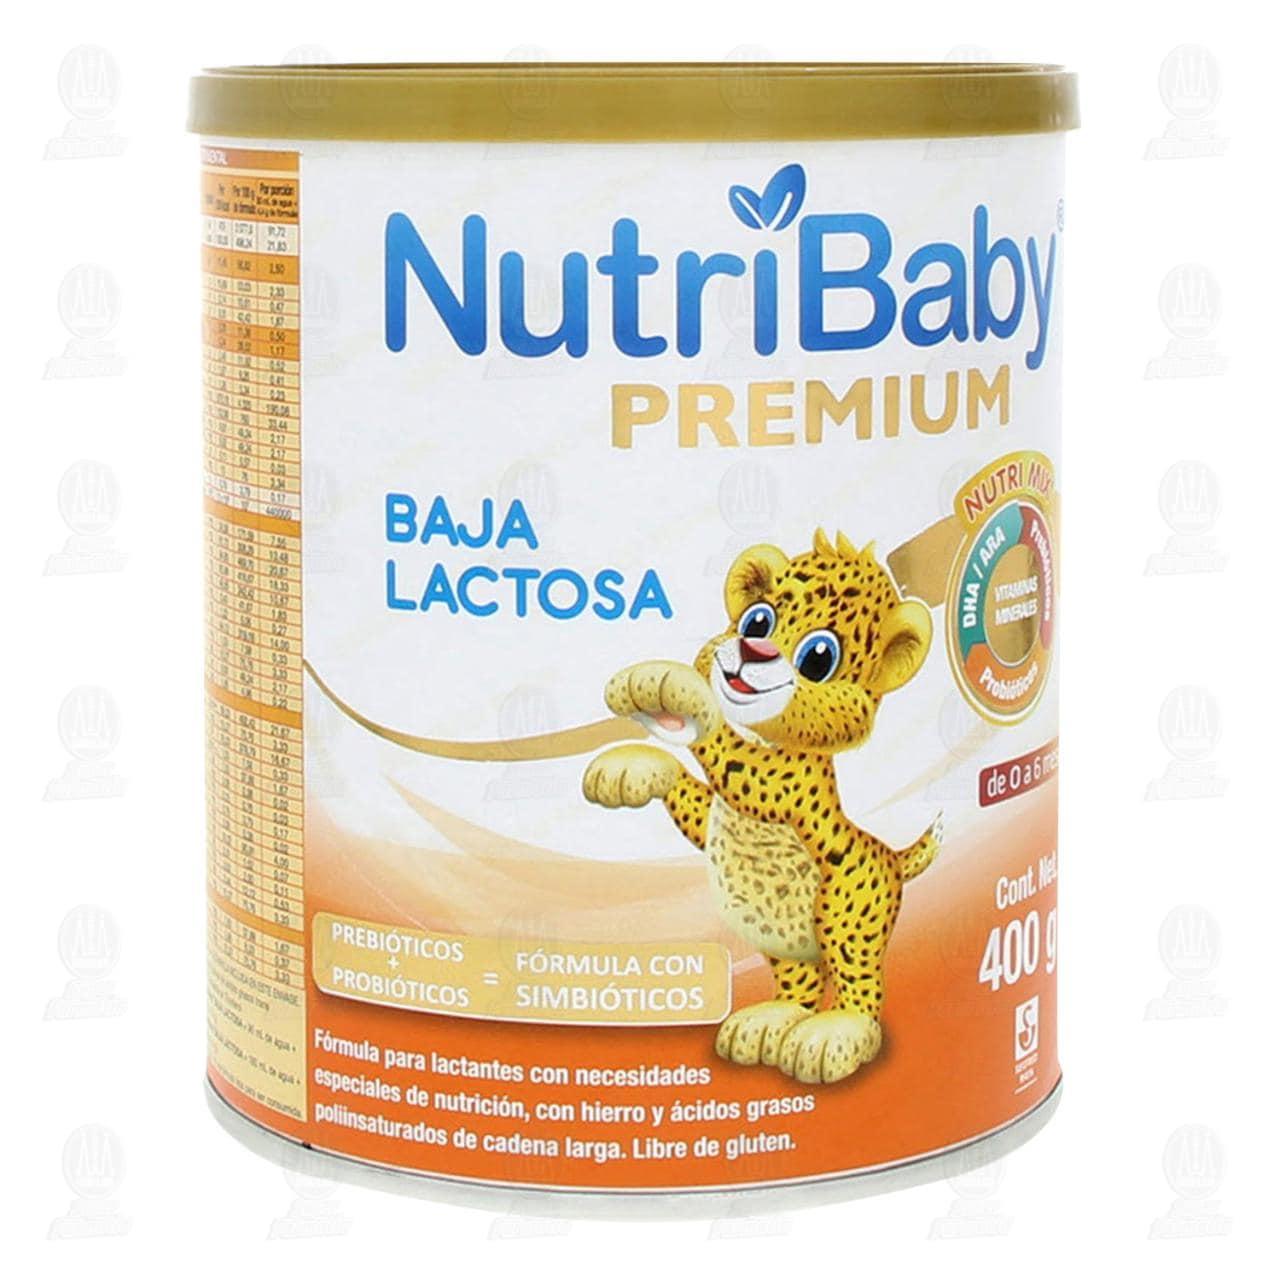 Comprar Fórmula Infantil Nutribaby Premium Baja Lactosa (Edad 0-6 Meses), 400 gr. en Farmacias Guadalajara